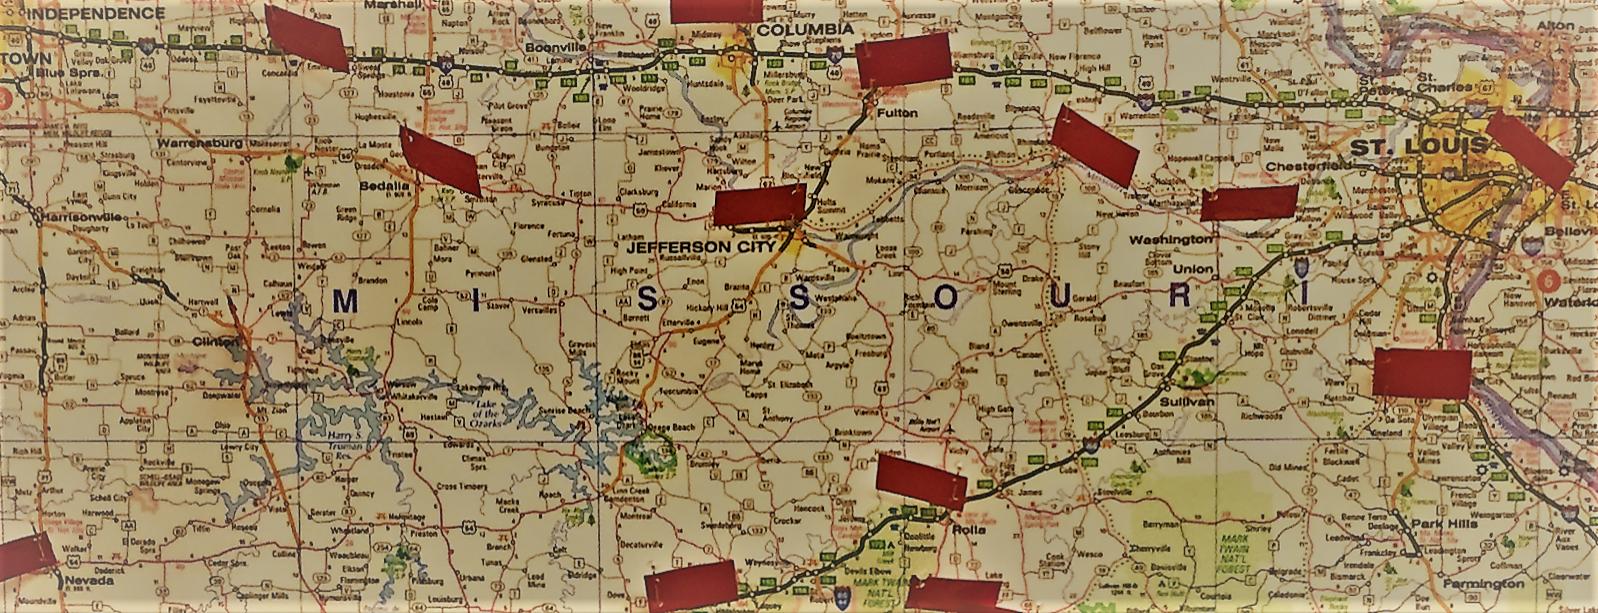 RL MAP 2.PNG